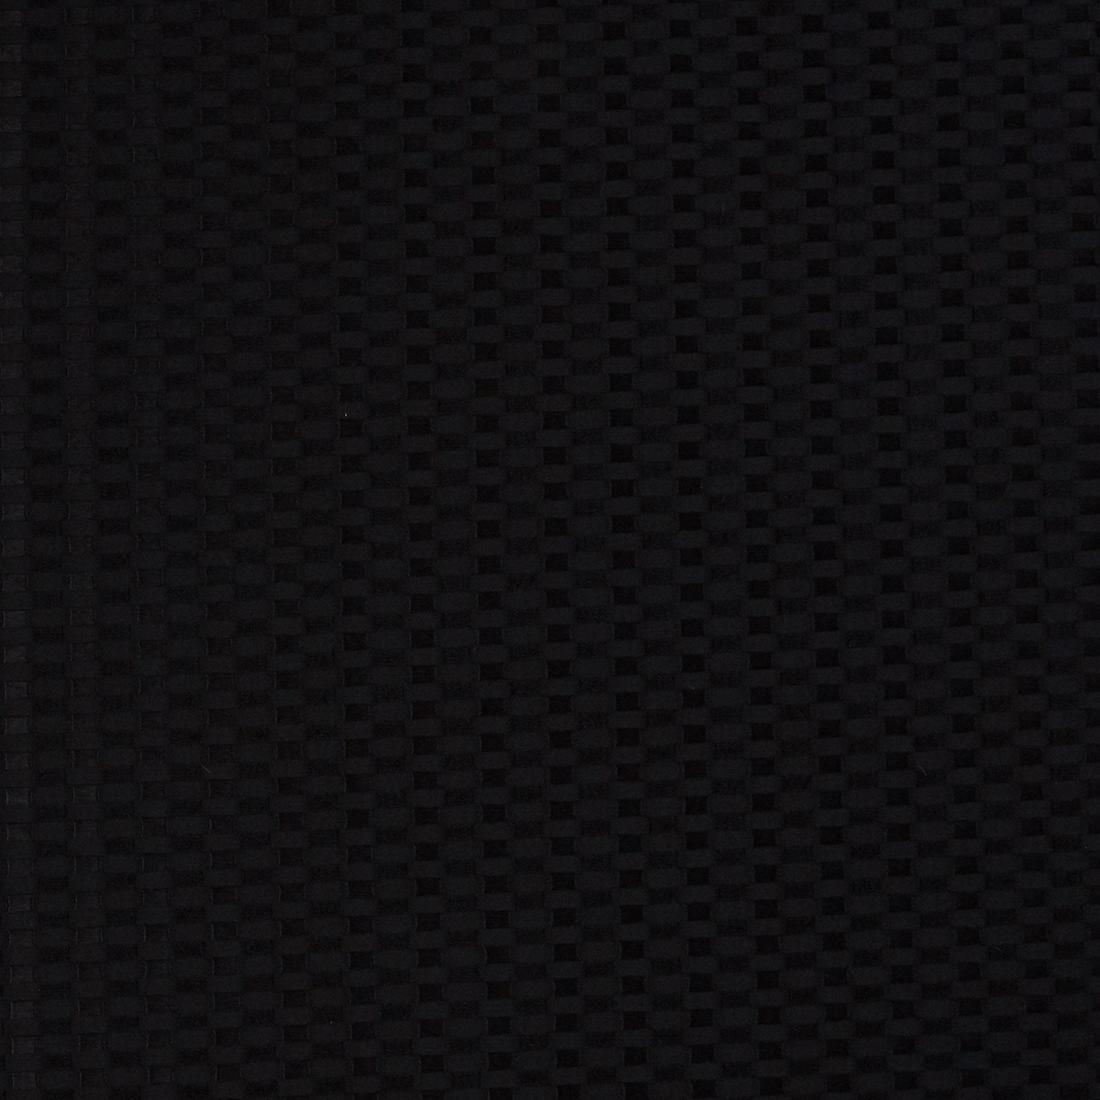 Basketweave Black Dress Fabric